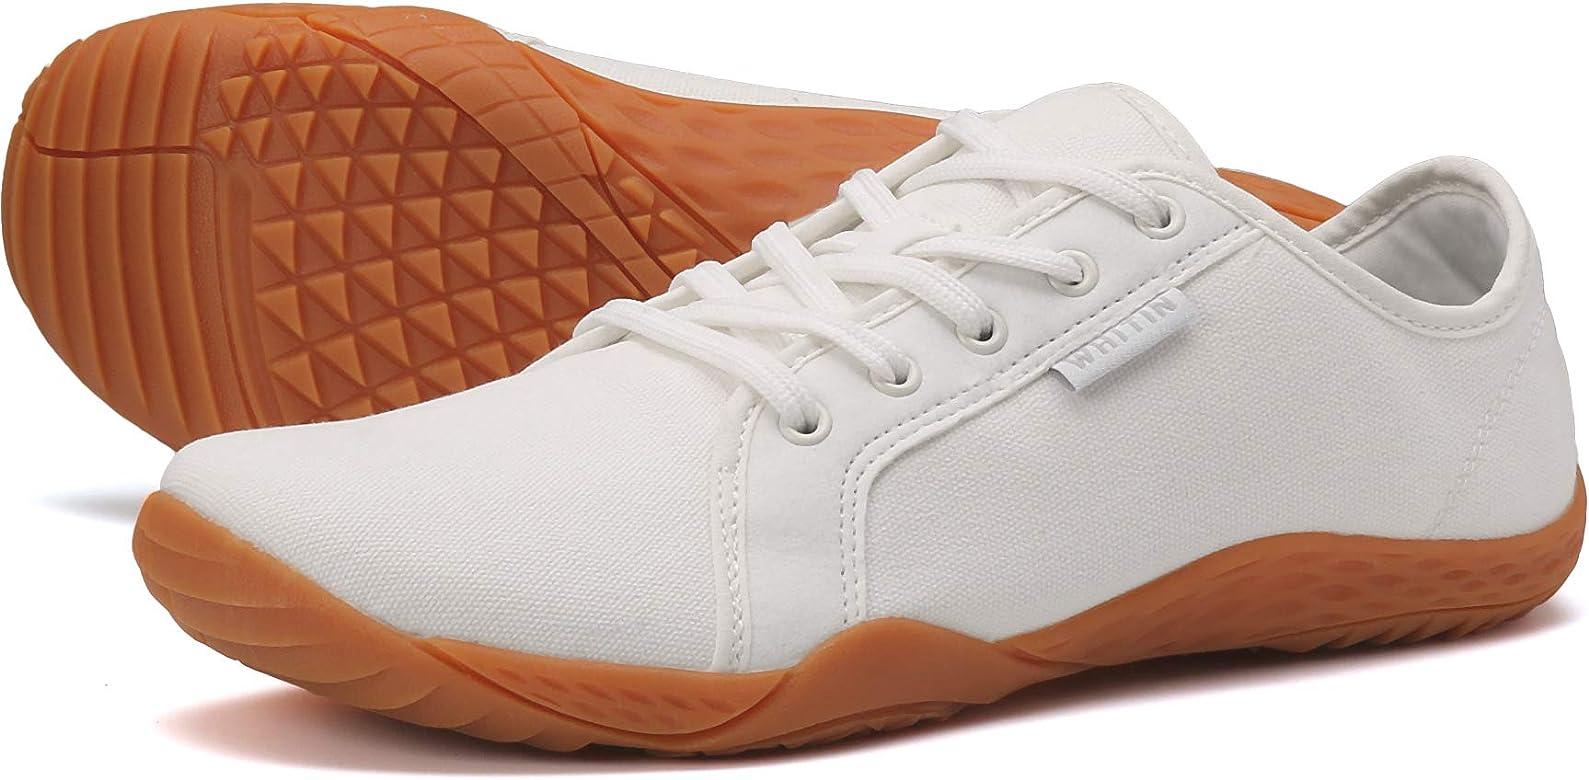 WHITIN Zapatos minimalistas unisex de punta ancha para correr descalzos, color Blanco, talla 41 EU: Amazon.es: Zapatos y complementos